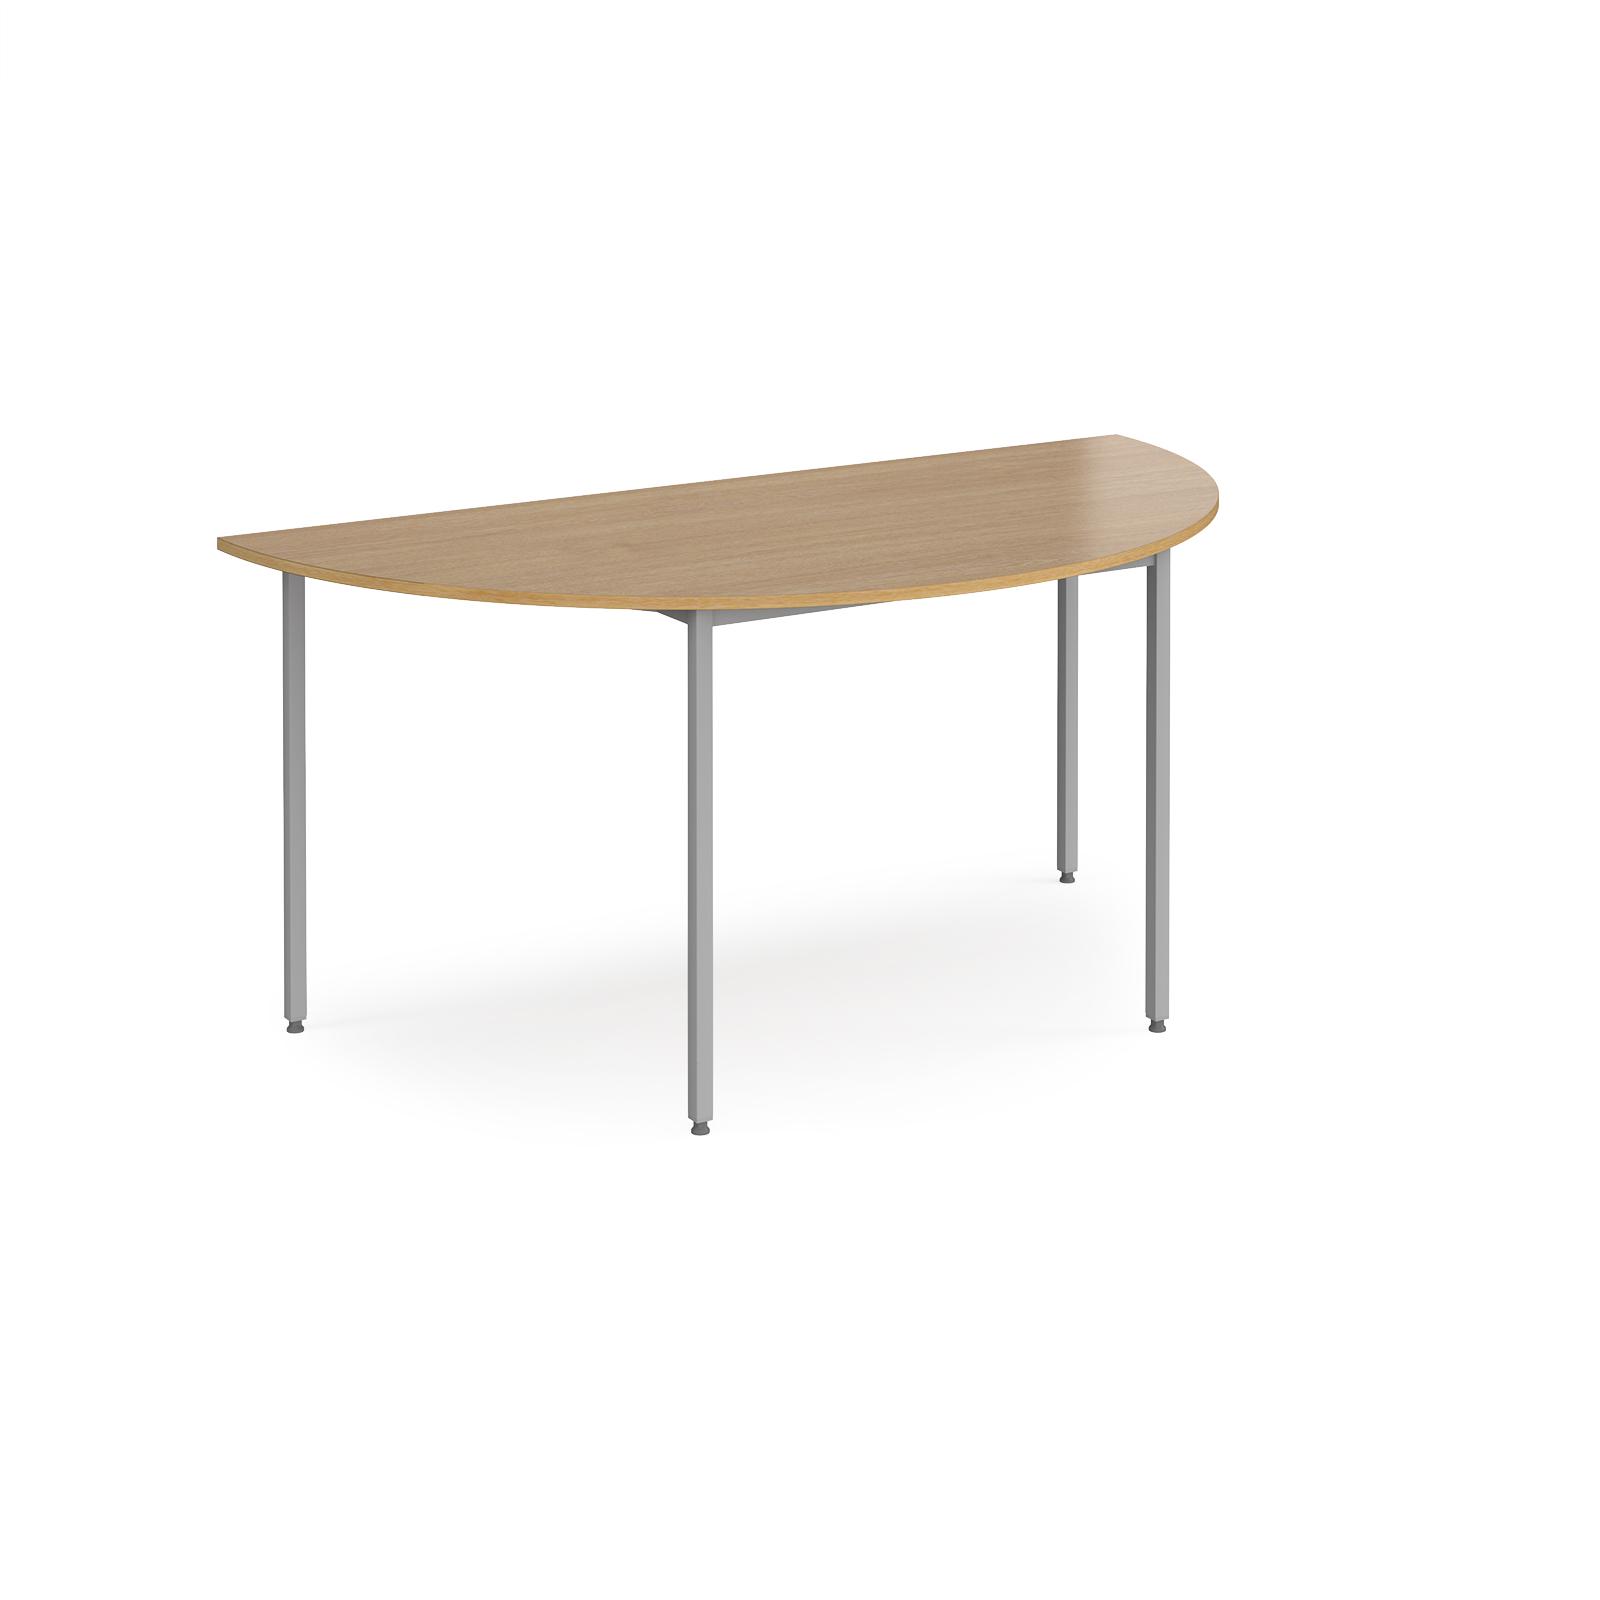 Semi circular flexi table with silver frame 1600mm x 800mm - oak